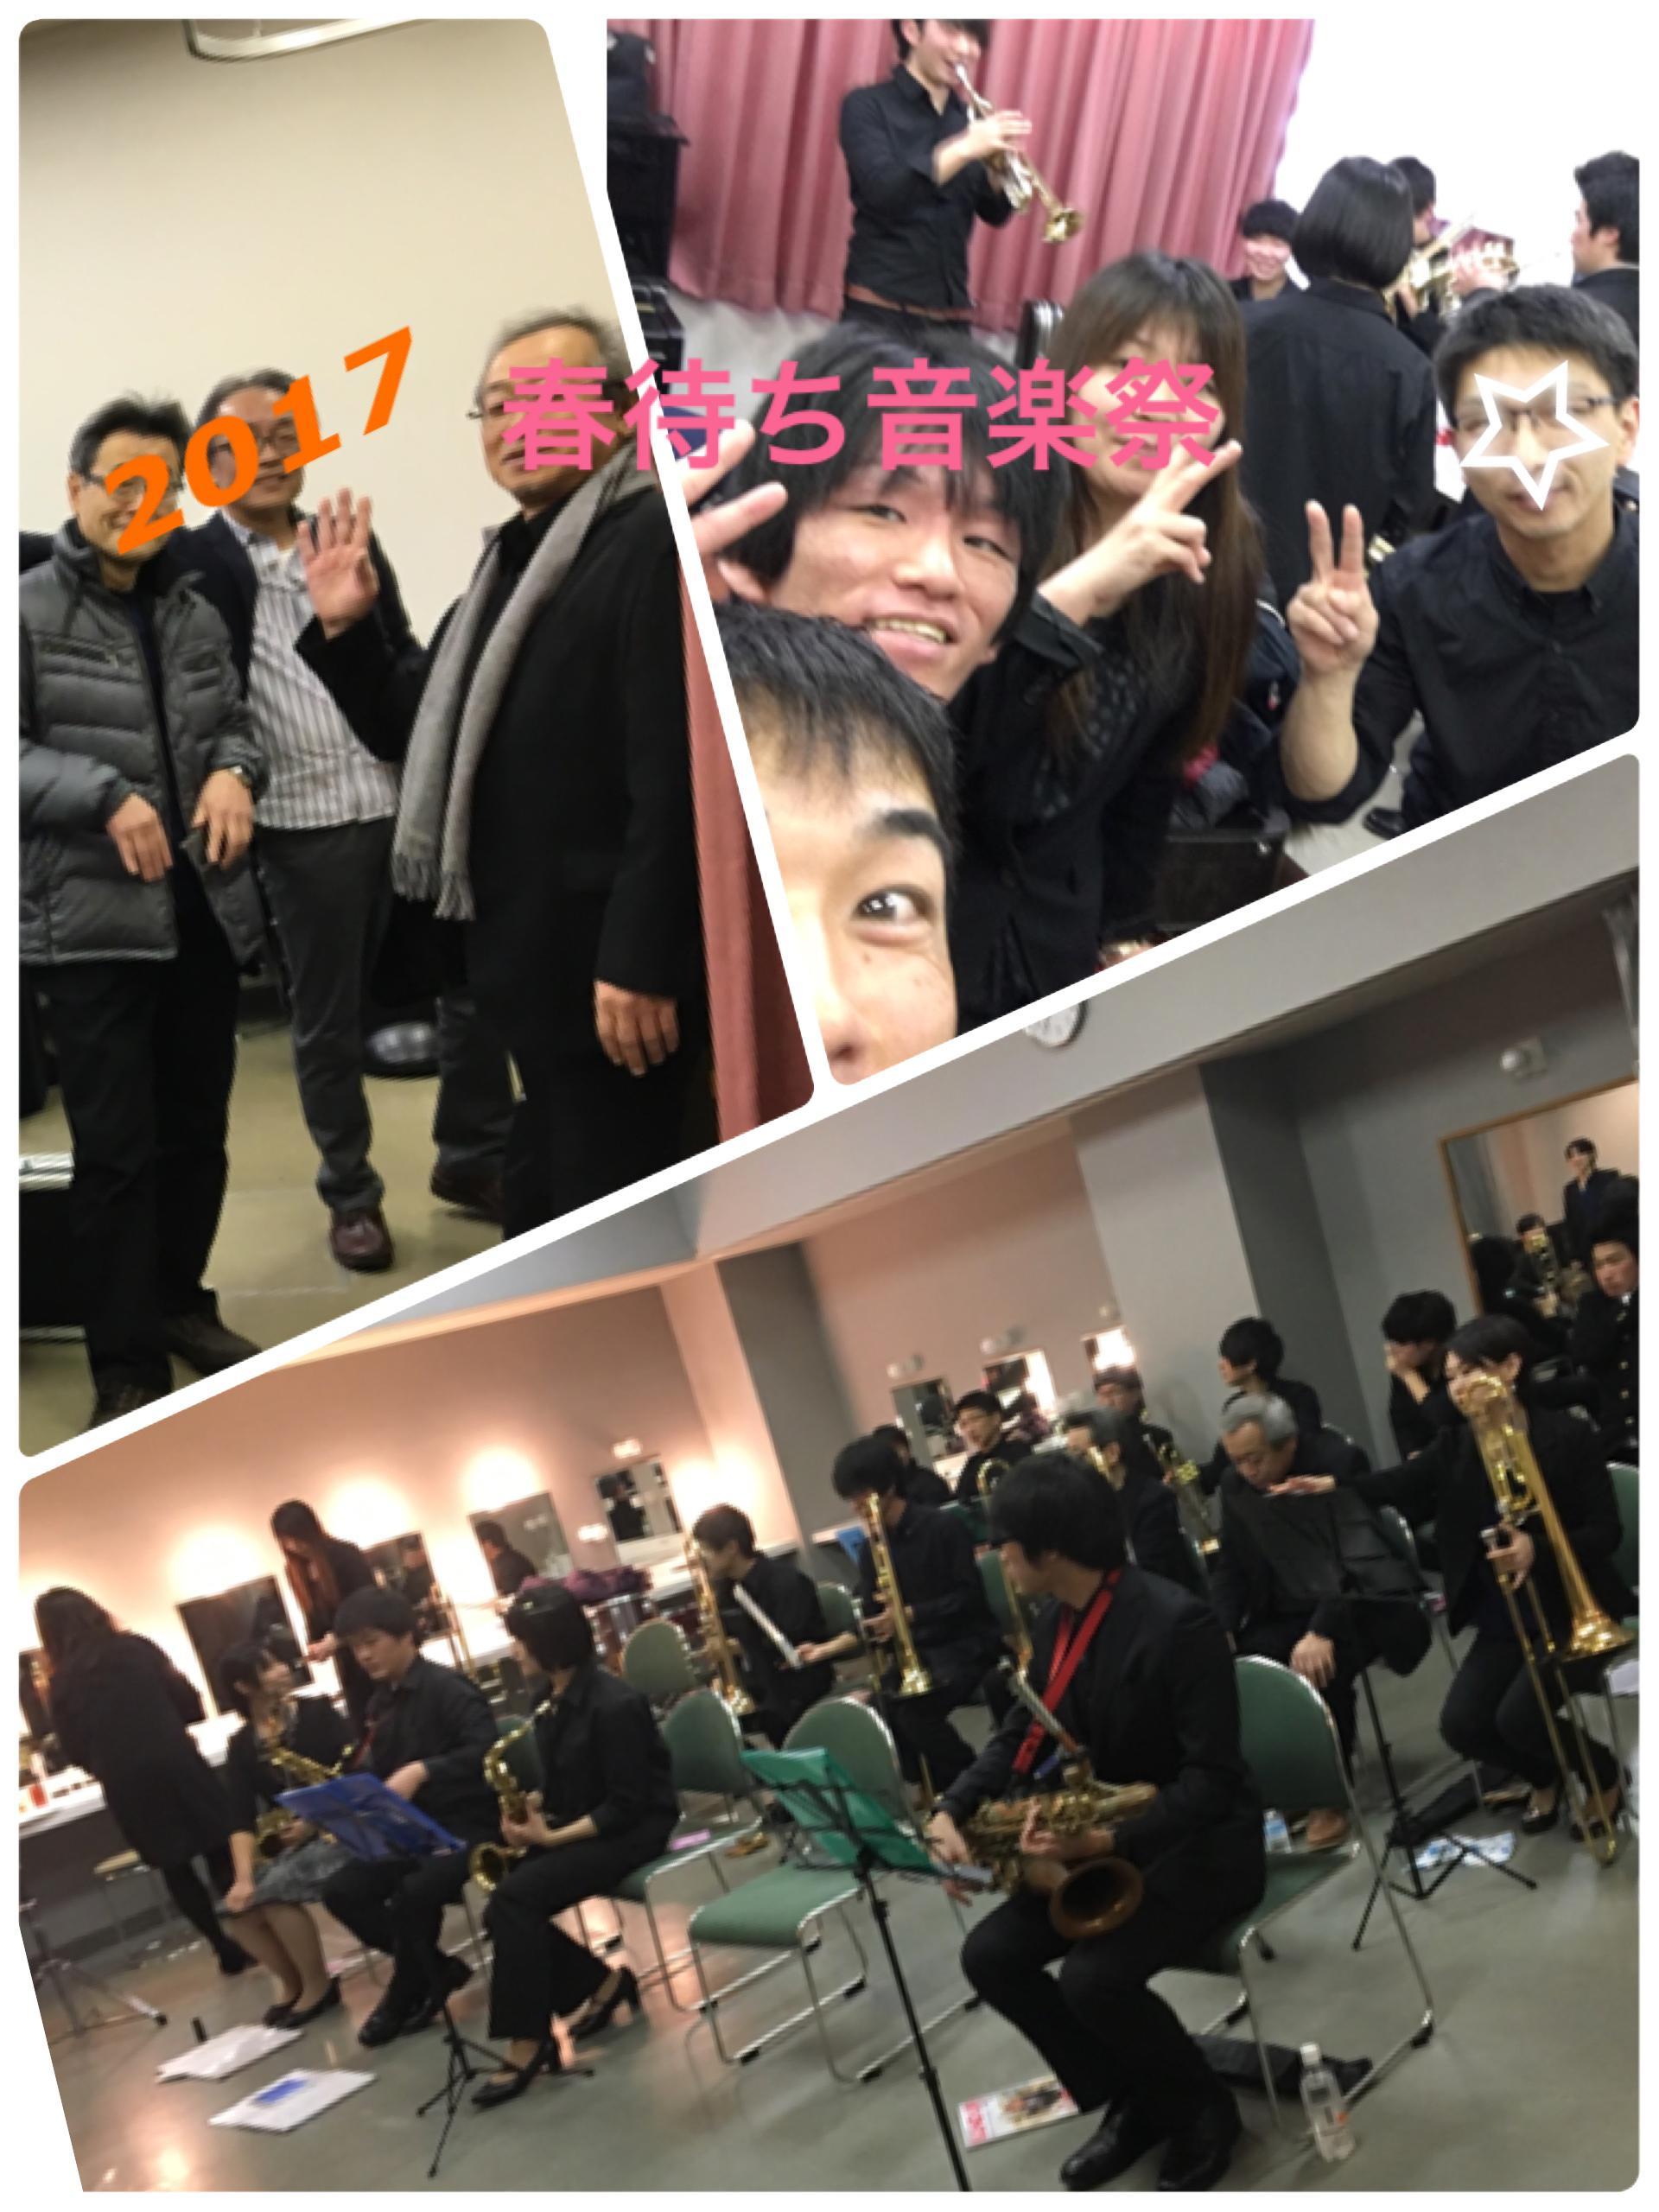 2017.2.26春待ち音楽祭in川西町